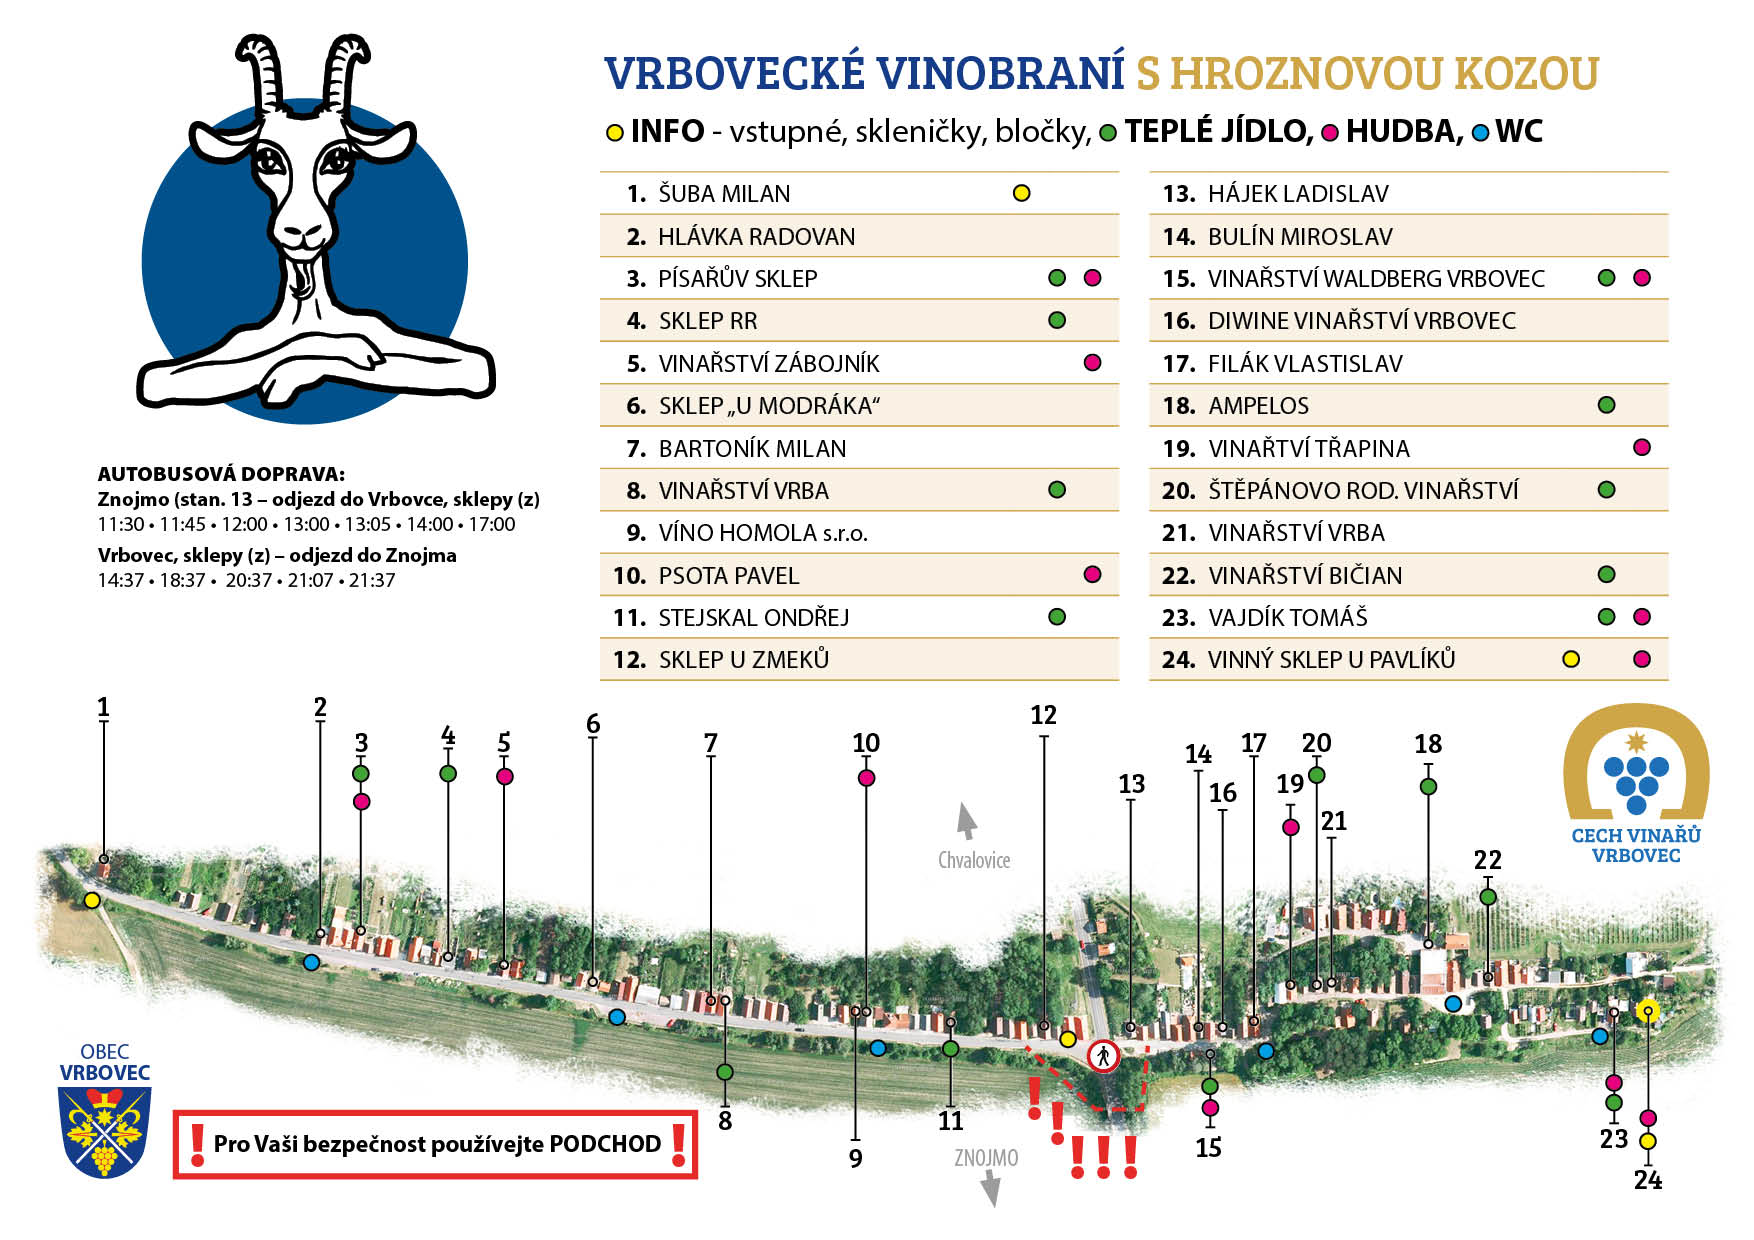 Mapa vinobraní 2019